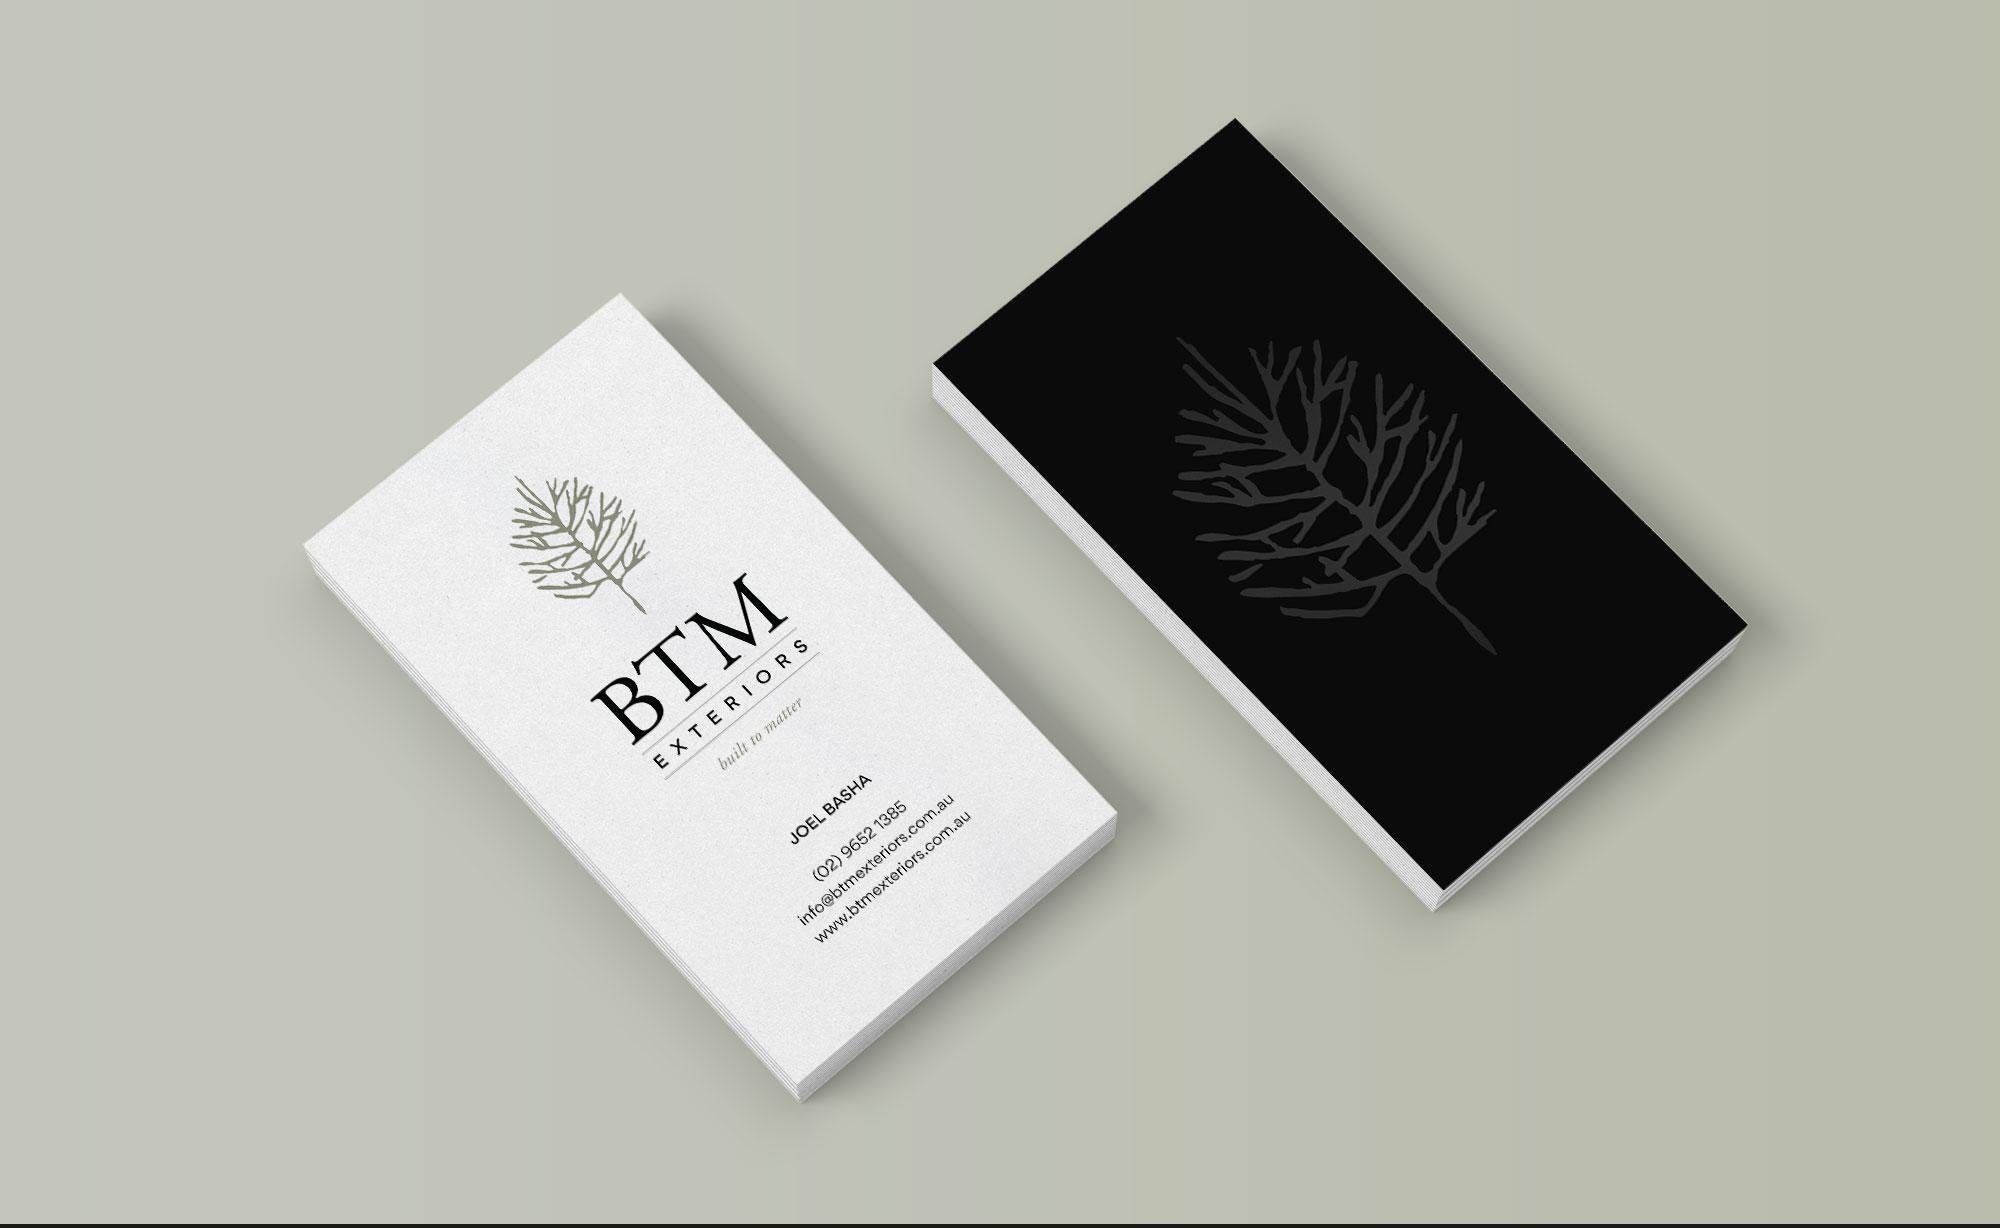 ©-Chris-Rae-Design-BTM-Exteriors-Print-Design-Stationary-Business-Card-01.jpg